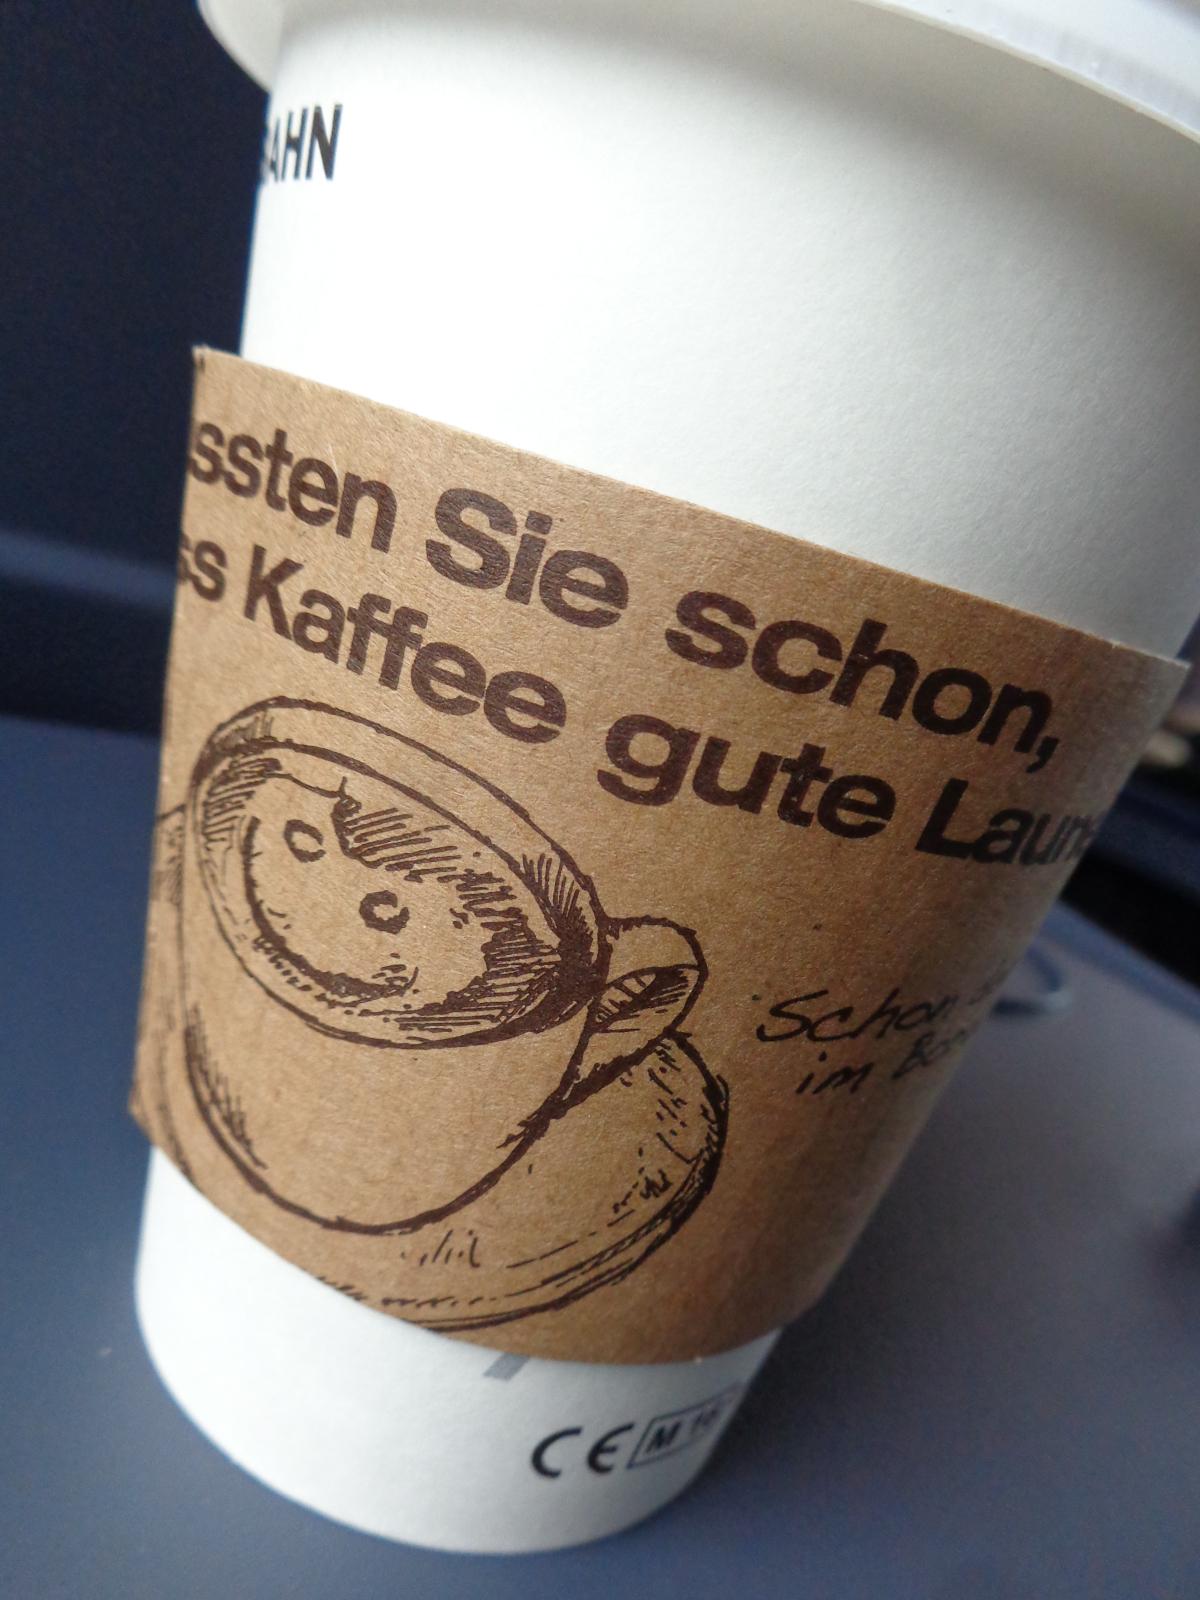 Kaffee Gute Laune